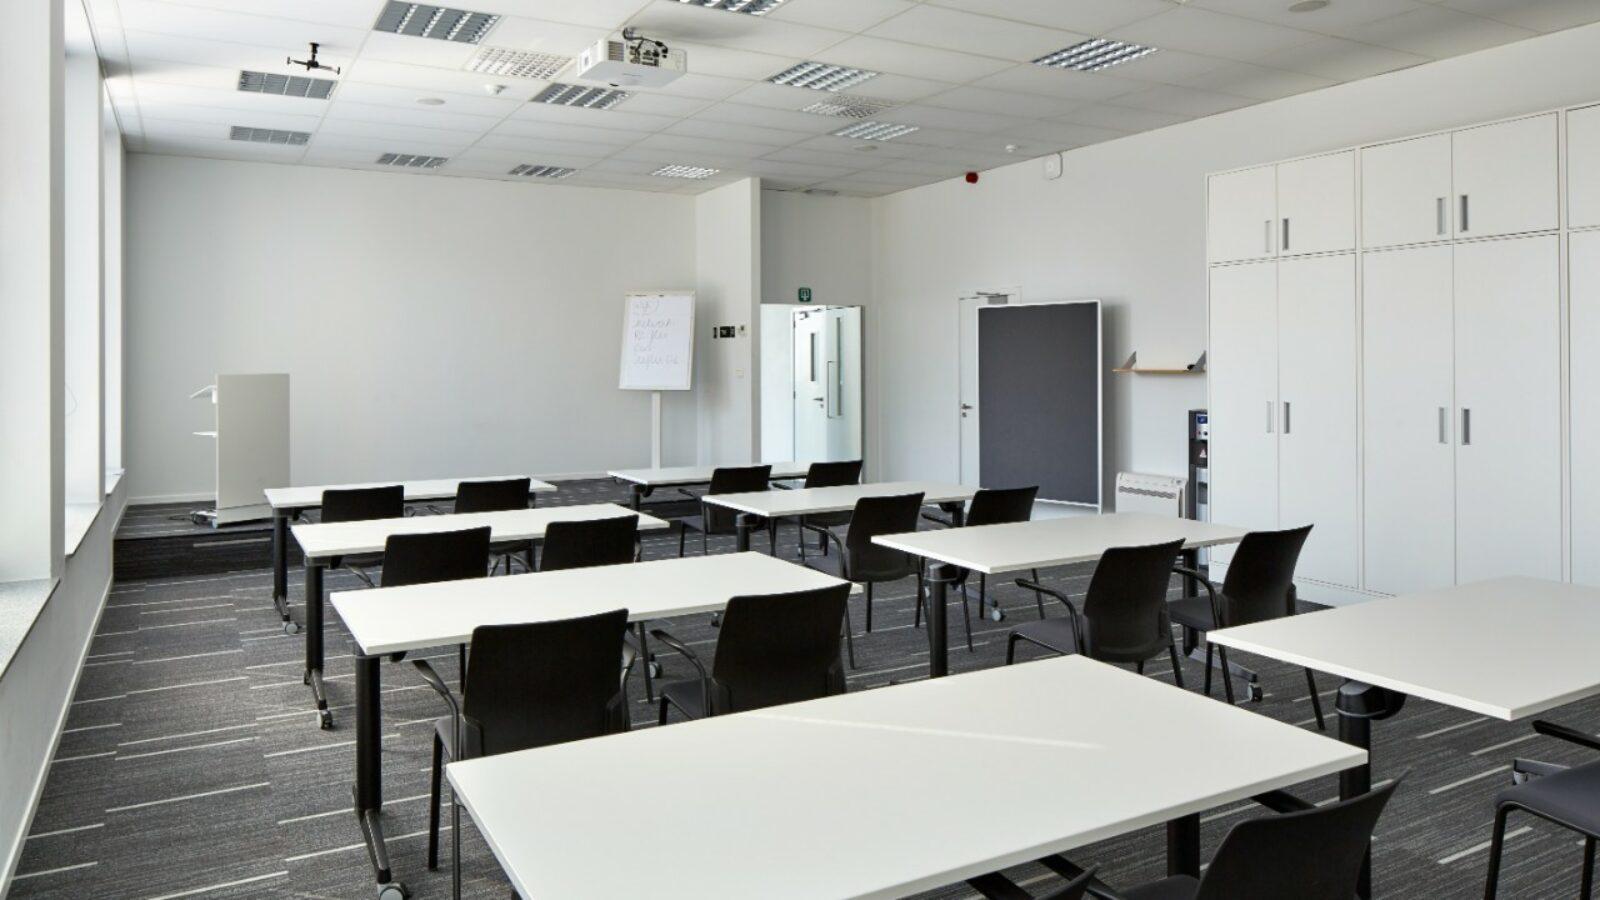 An overview of the Novigo meeting room in Greenhouse Mechelen